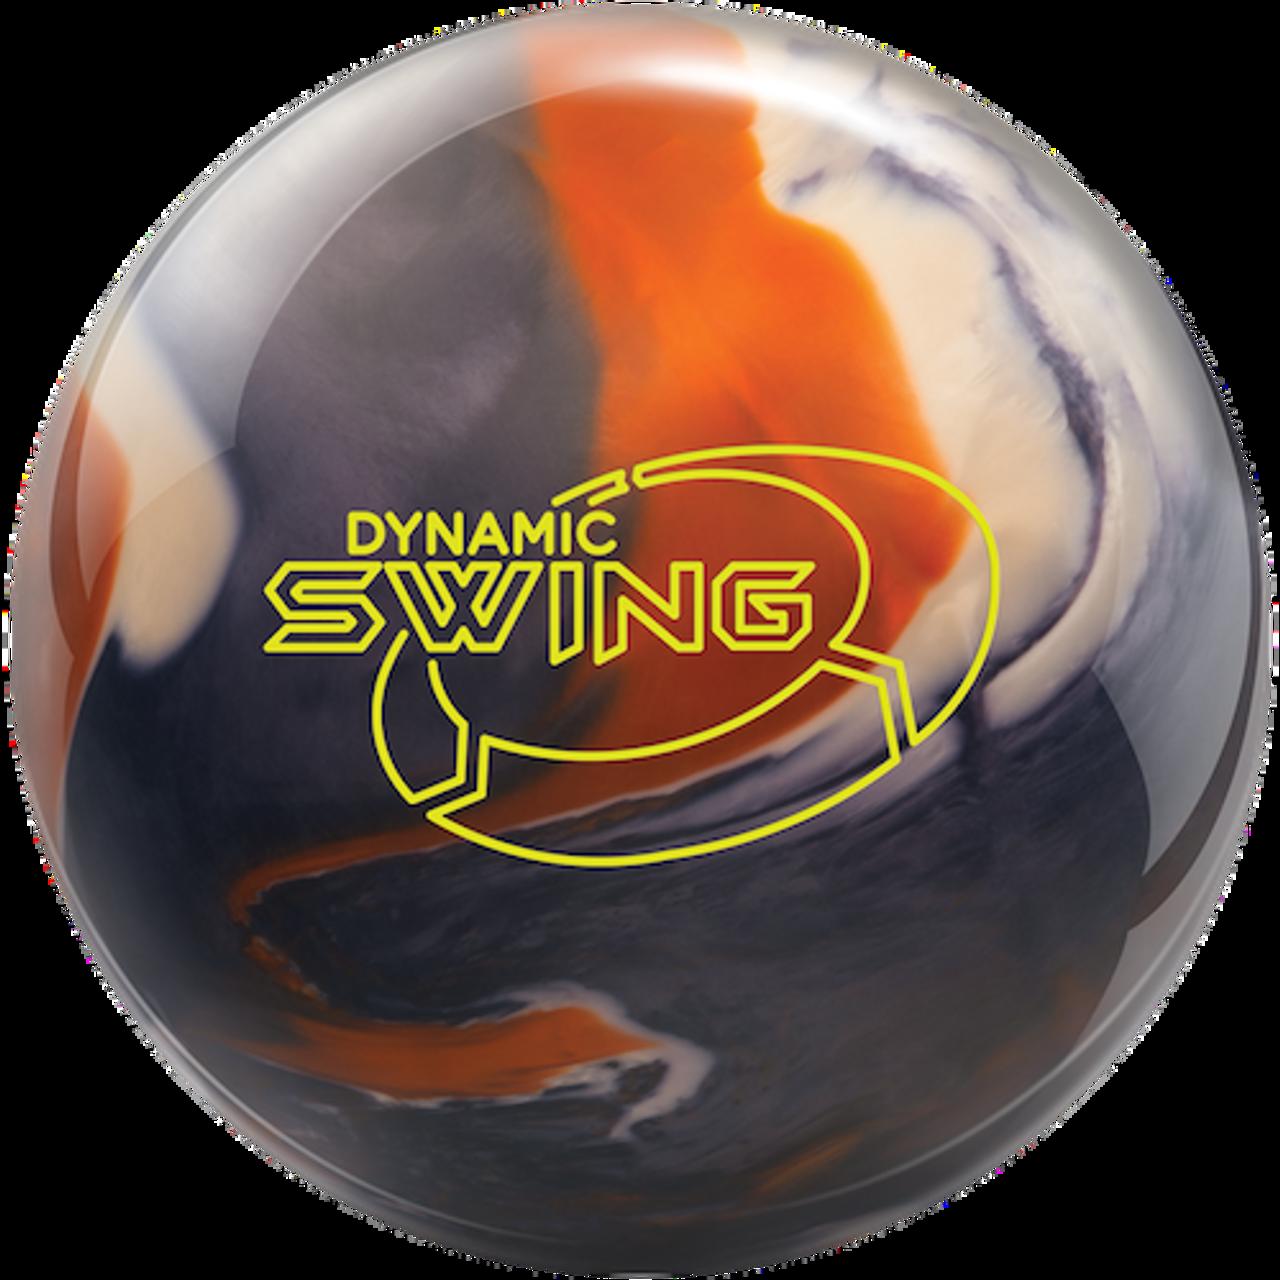 Columbia 300 Dynamic Swing Pearl Bowling Ball